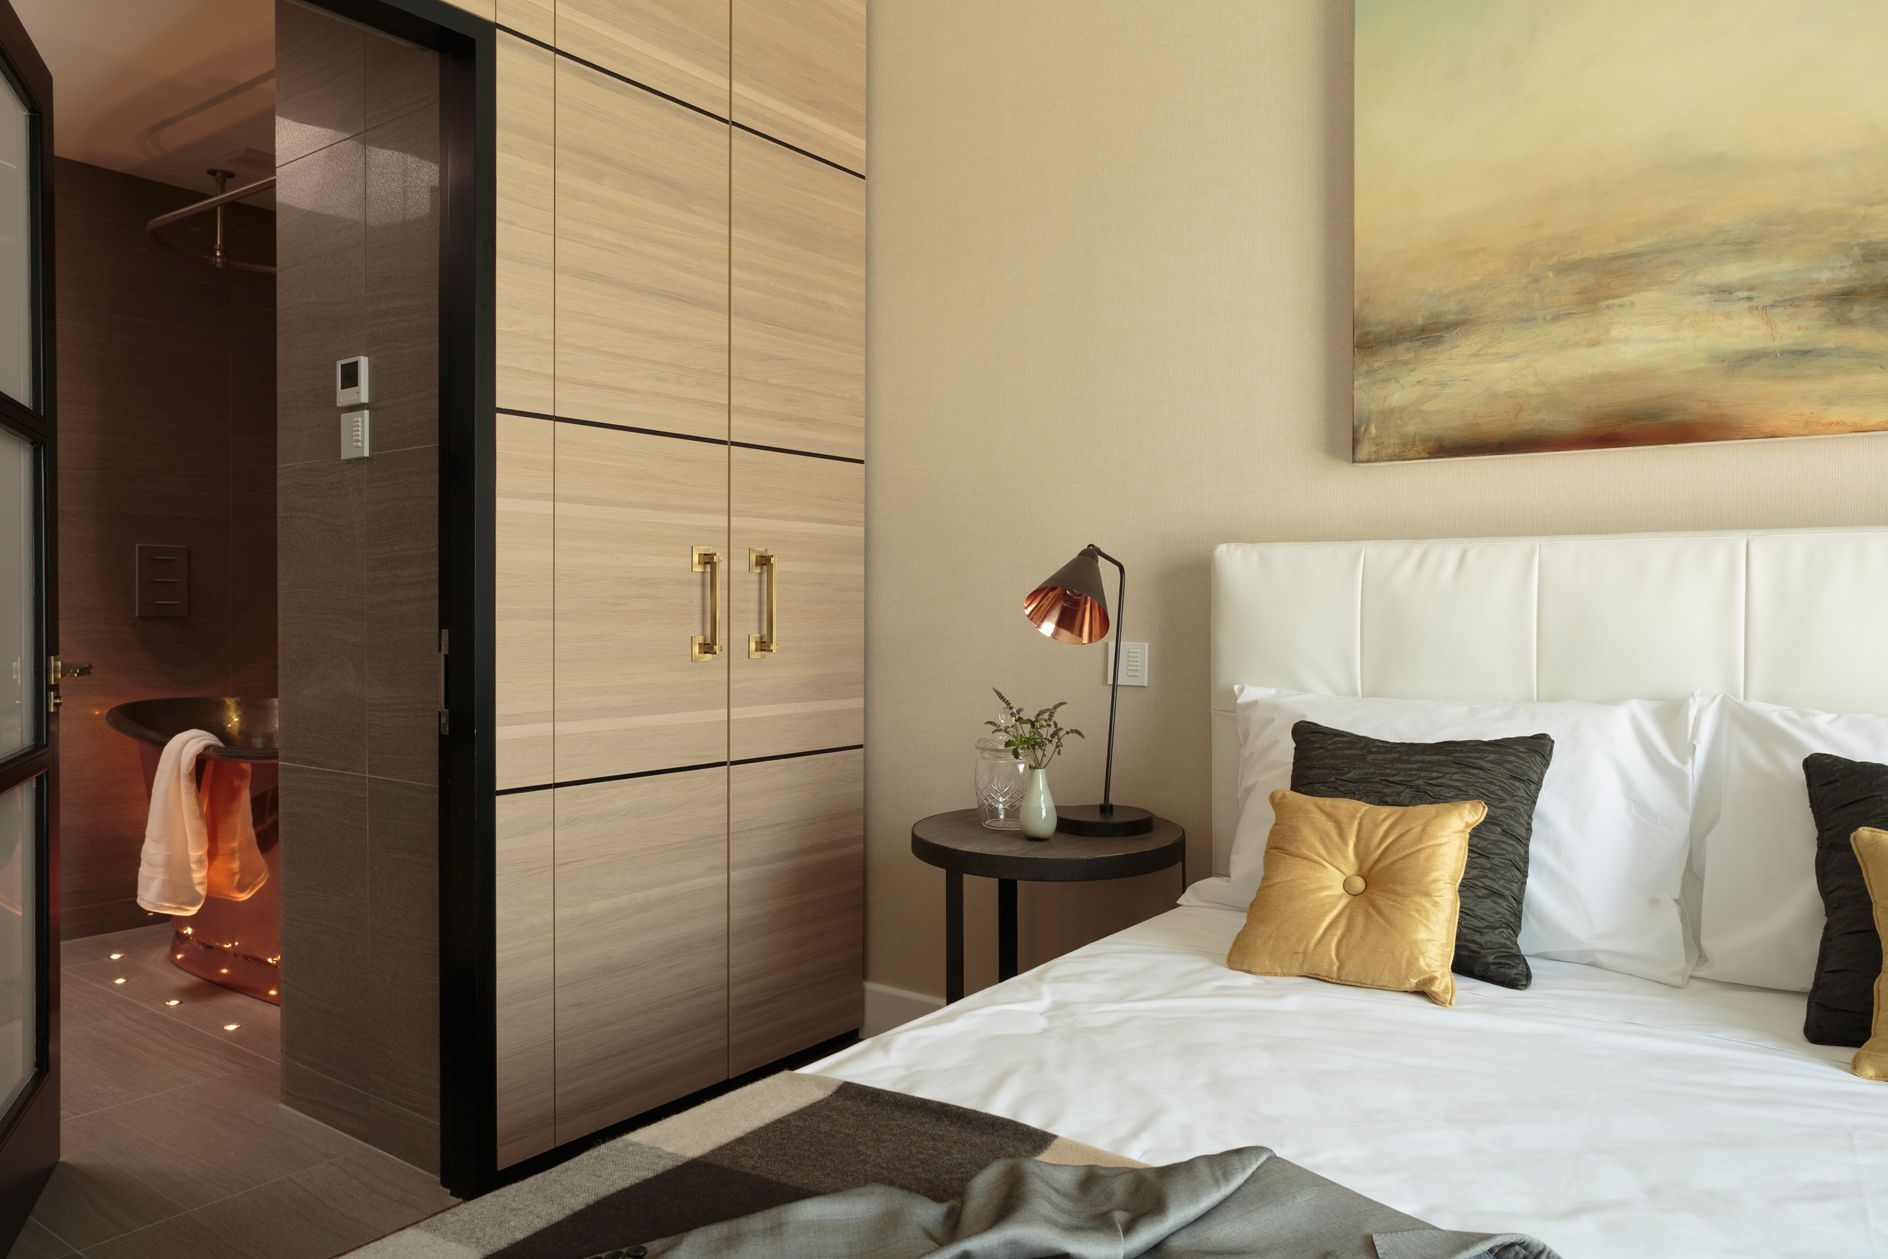 Storage Space As Separating Idea Bedroom Design Apartment Design Open Plan Bathrooms